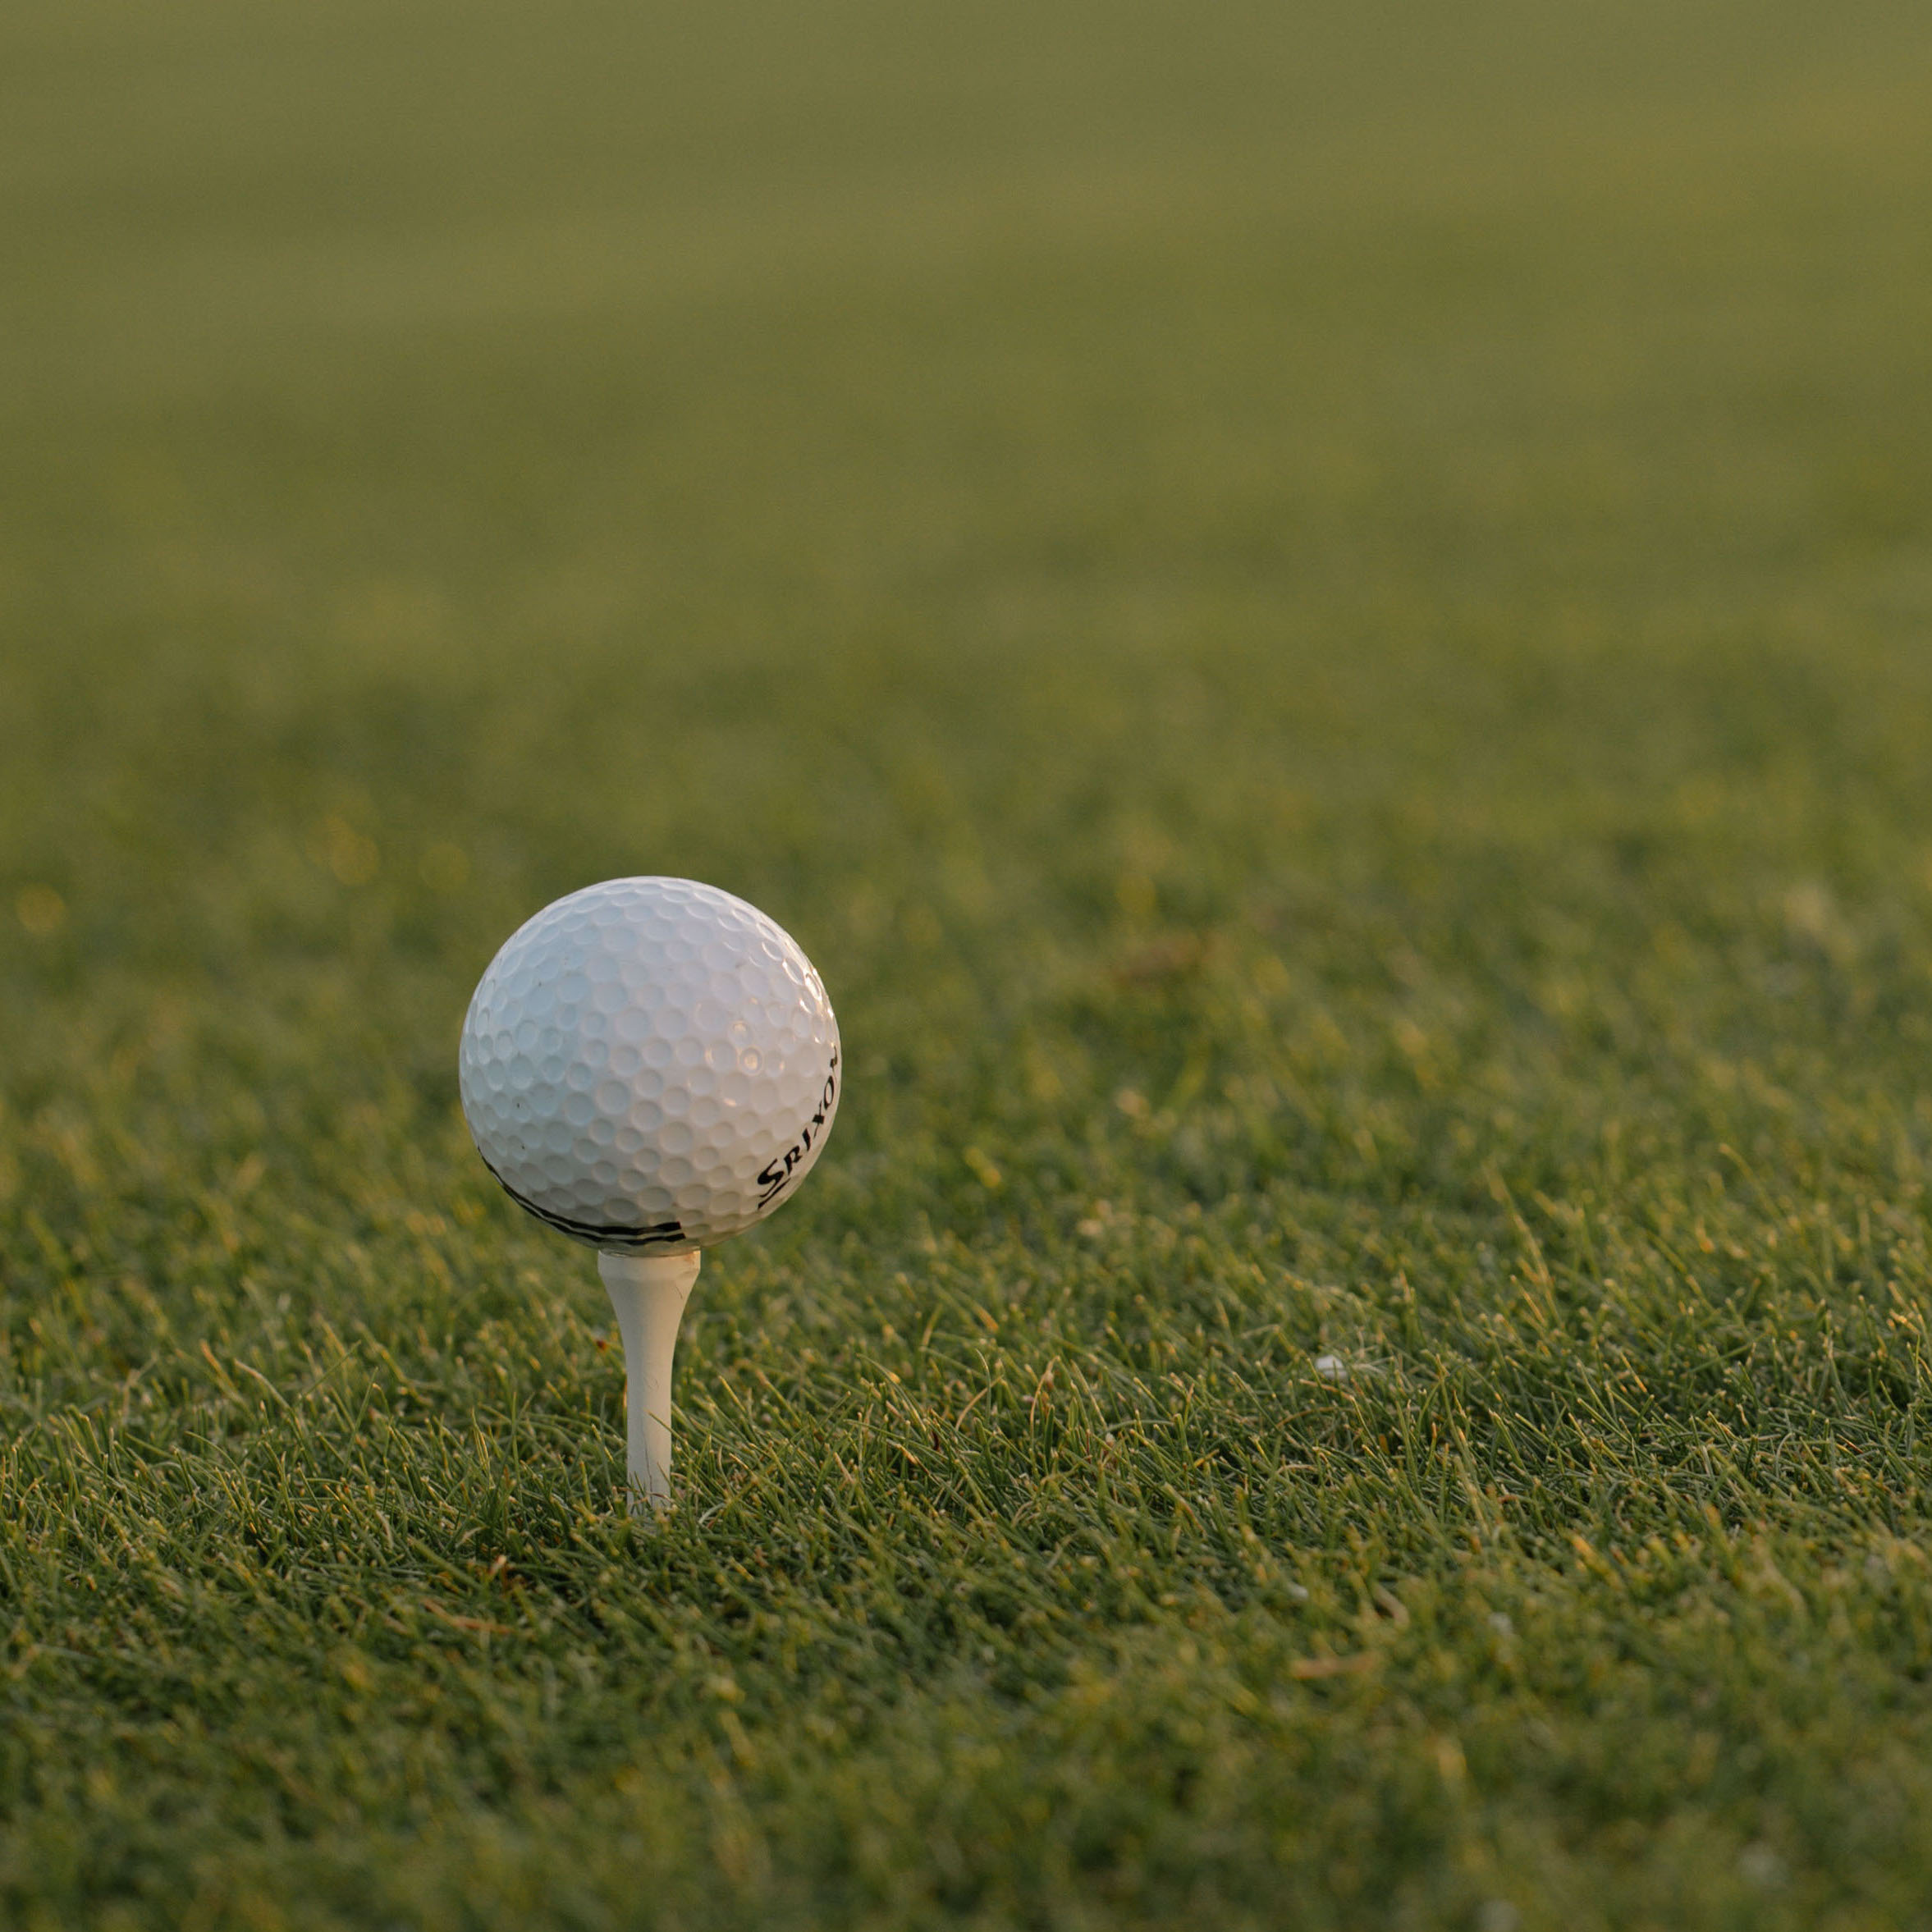 Golf Ball on a golf tee